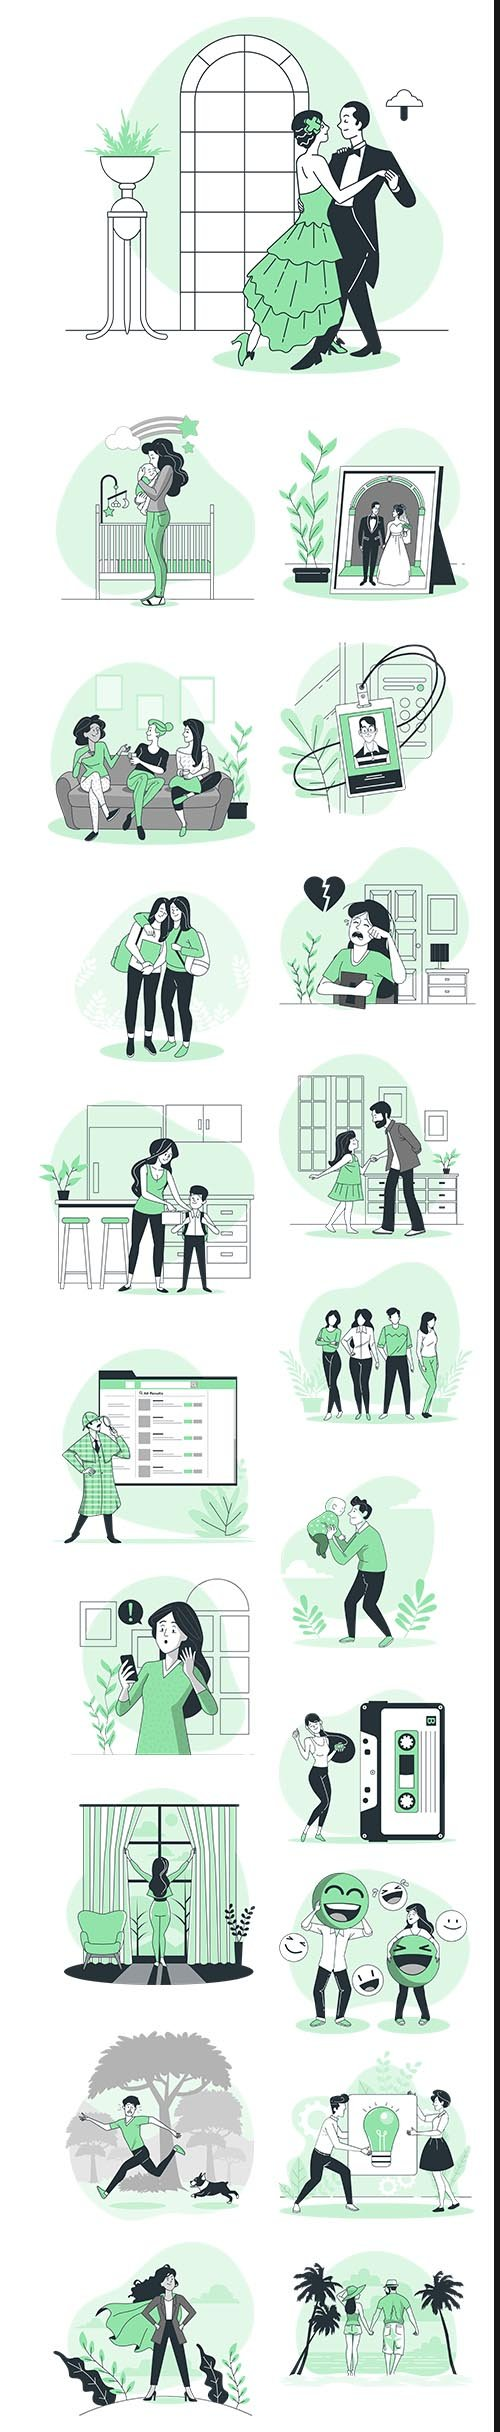 Vector Green Illustrations People Concept Vol 3